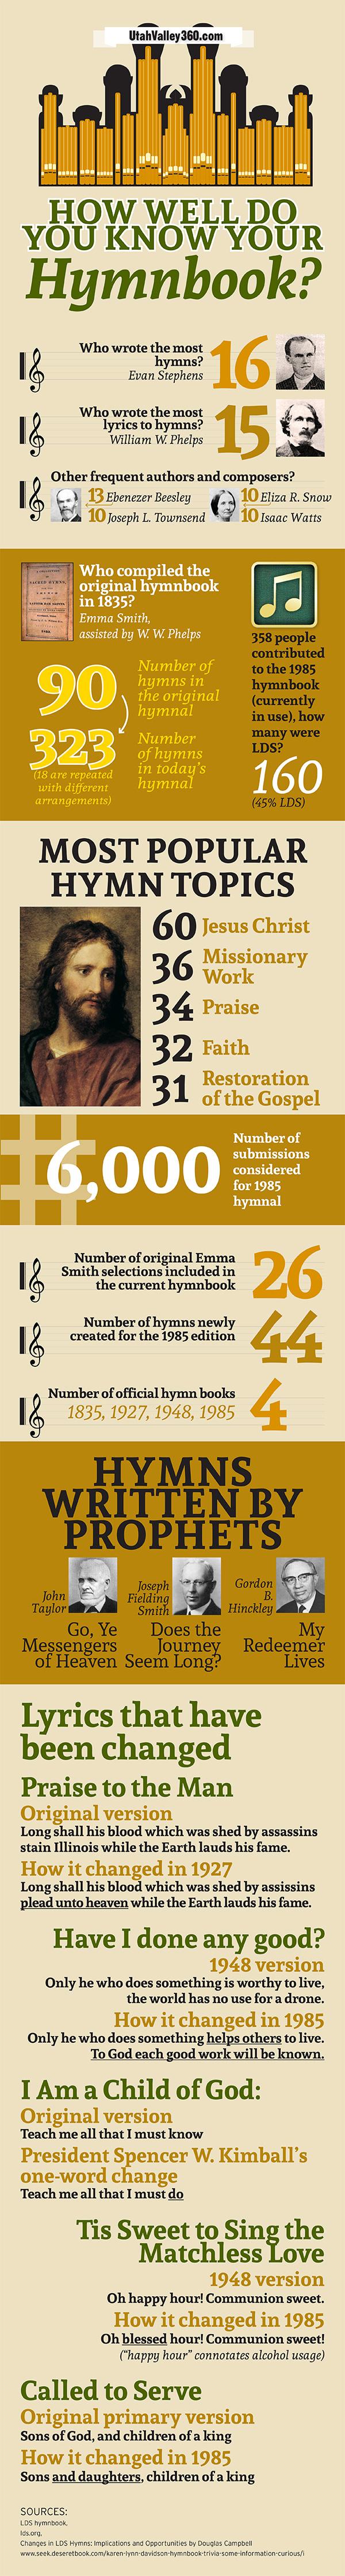 hymnbook-infographic-hr